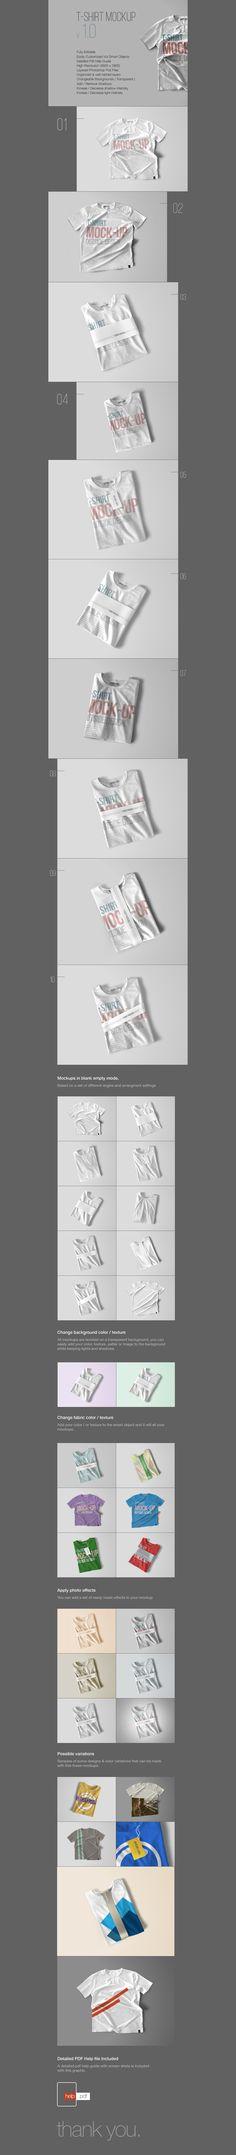 Free PSD T-Shirt Mockup Template (96 MB) | themeraid.com | #free #mockup…